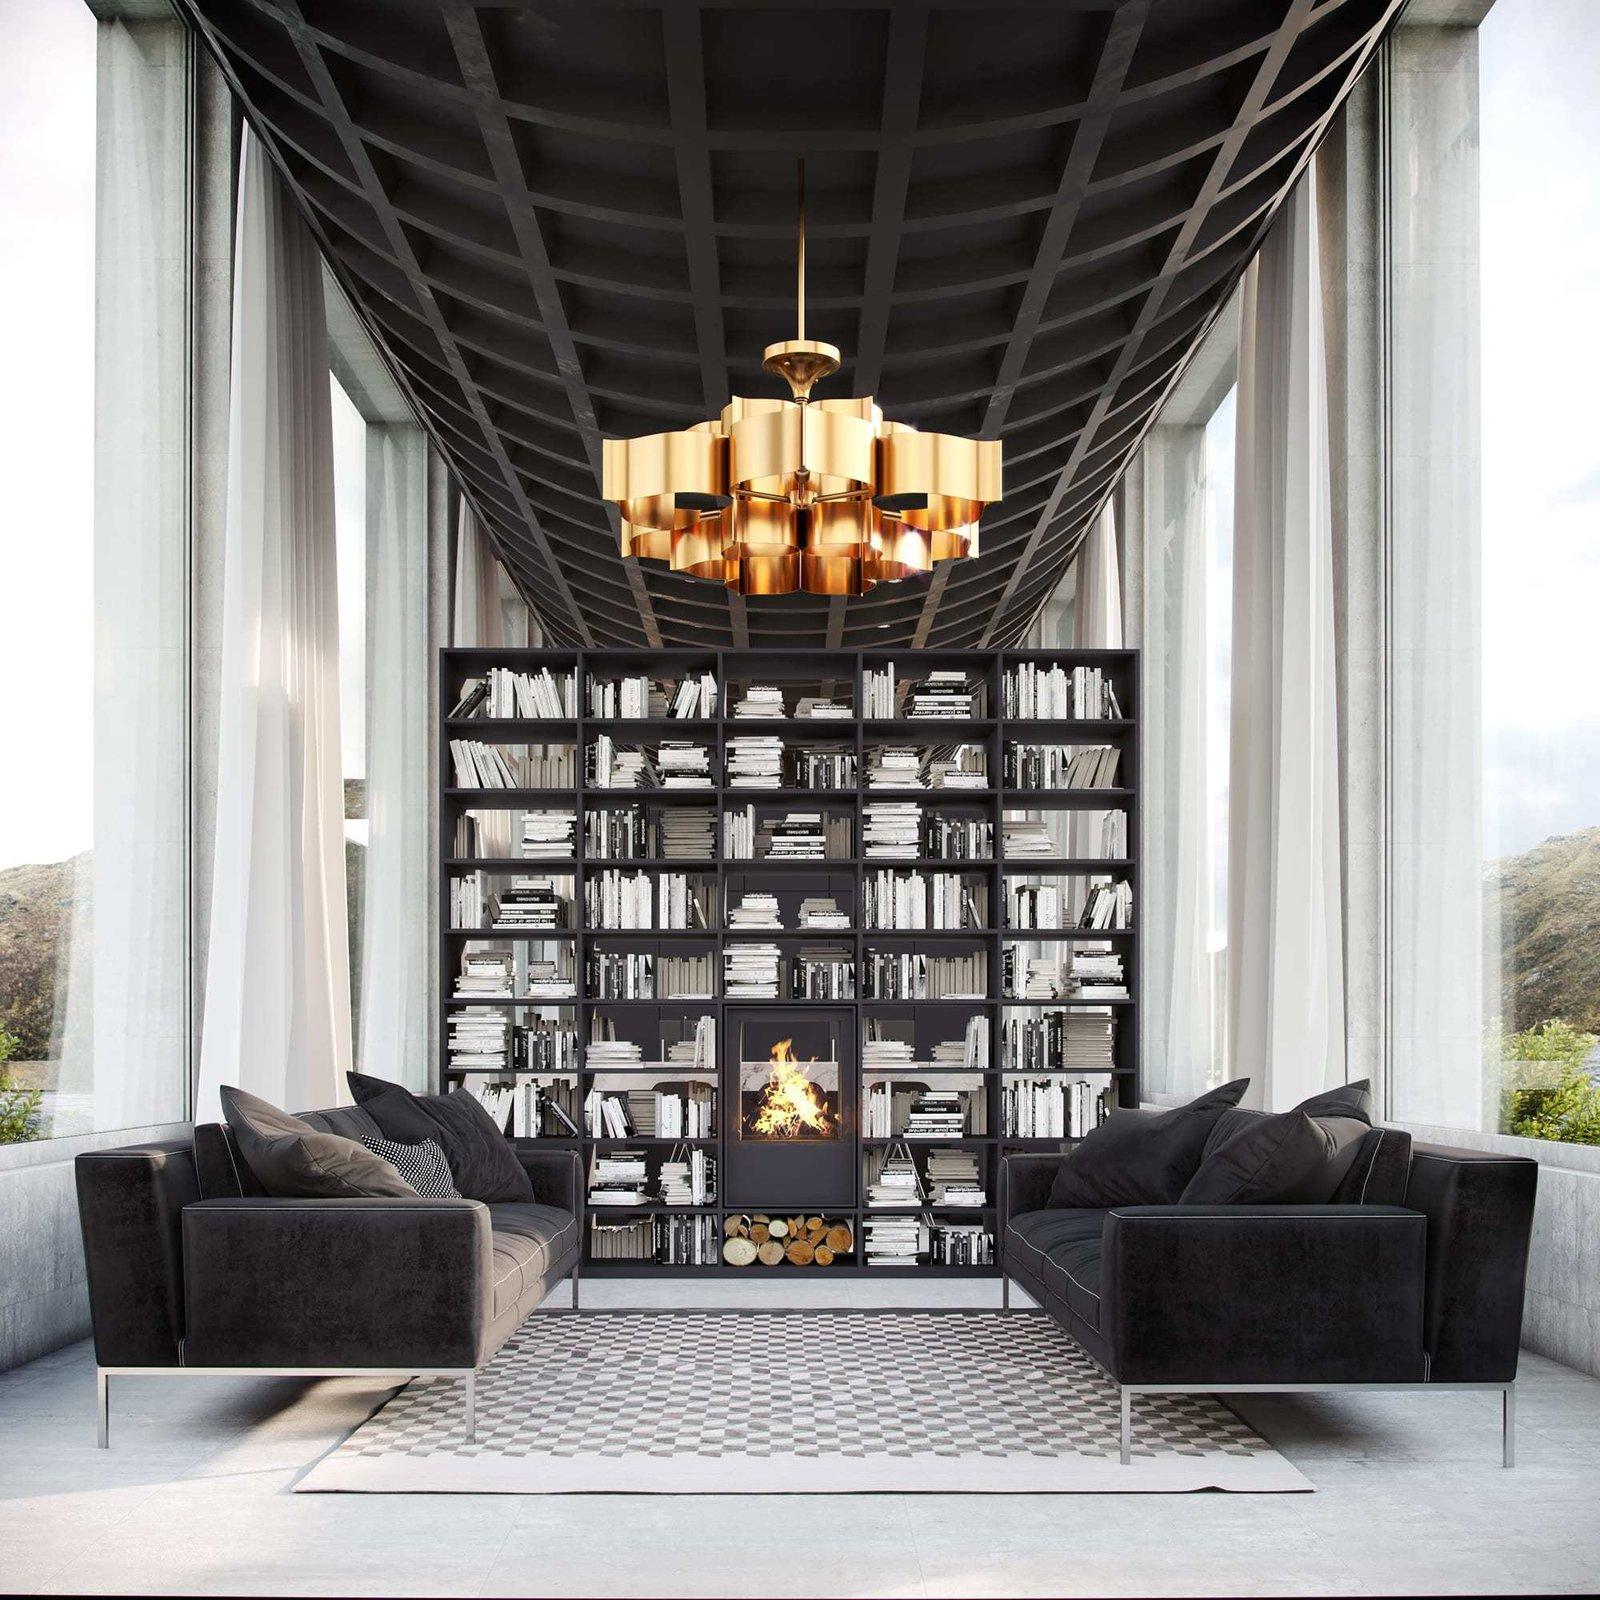 Living Room, Pendant Lighting, Accent Lighting, Sofa, Concrete Floor, Wood Burning Fireplace, and Standard Layout Fireplace Living Room  Infinity House by Vladimir Konovalov